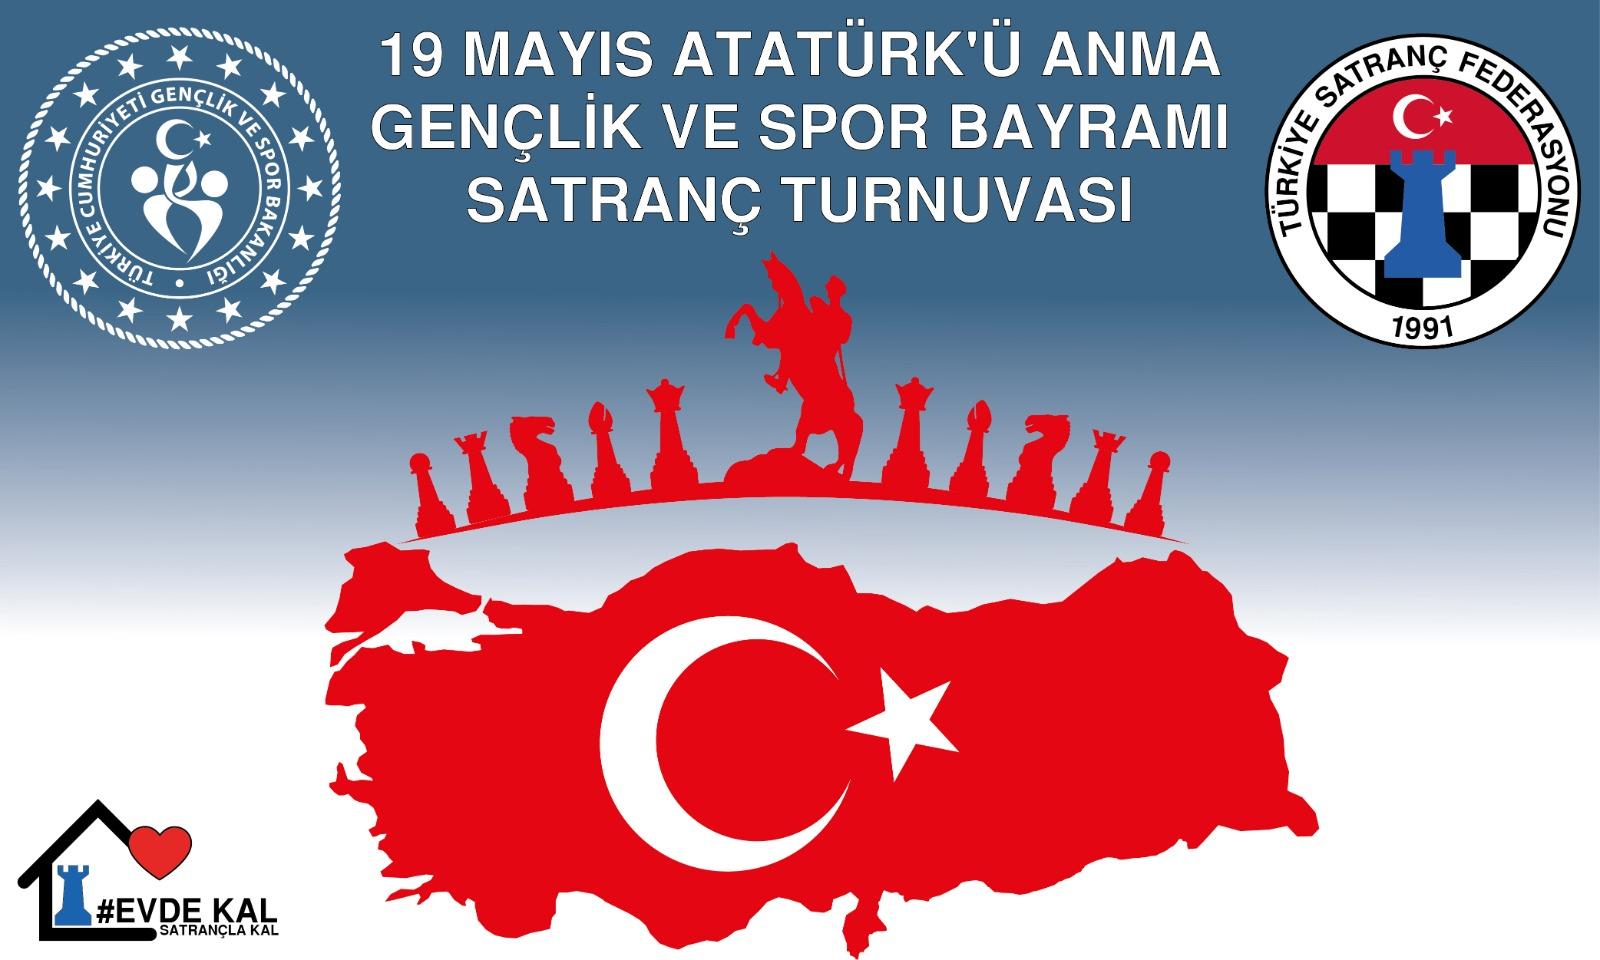 19 mays poster - yatay